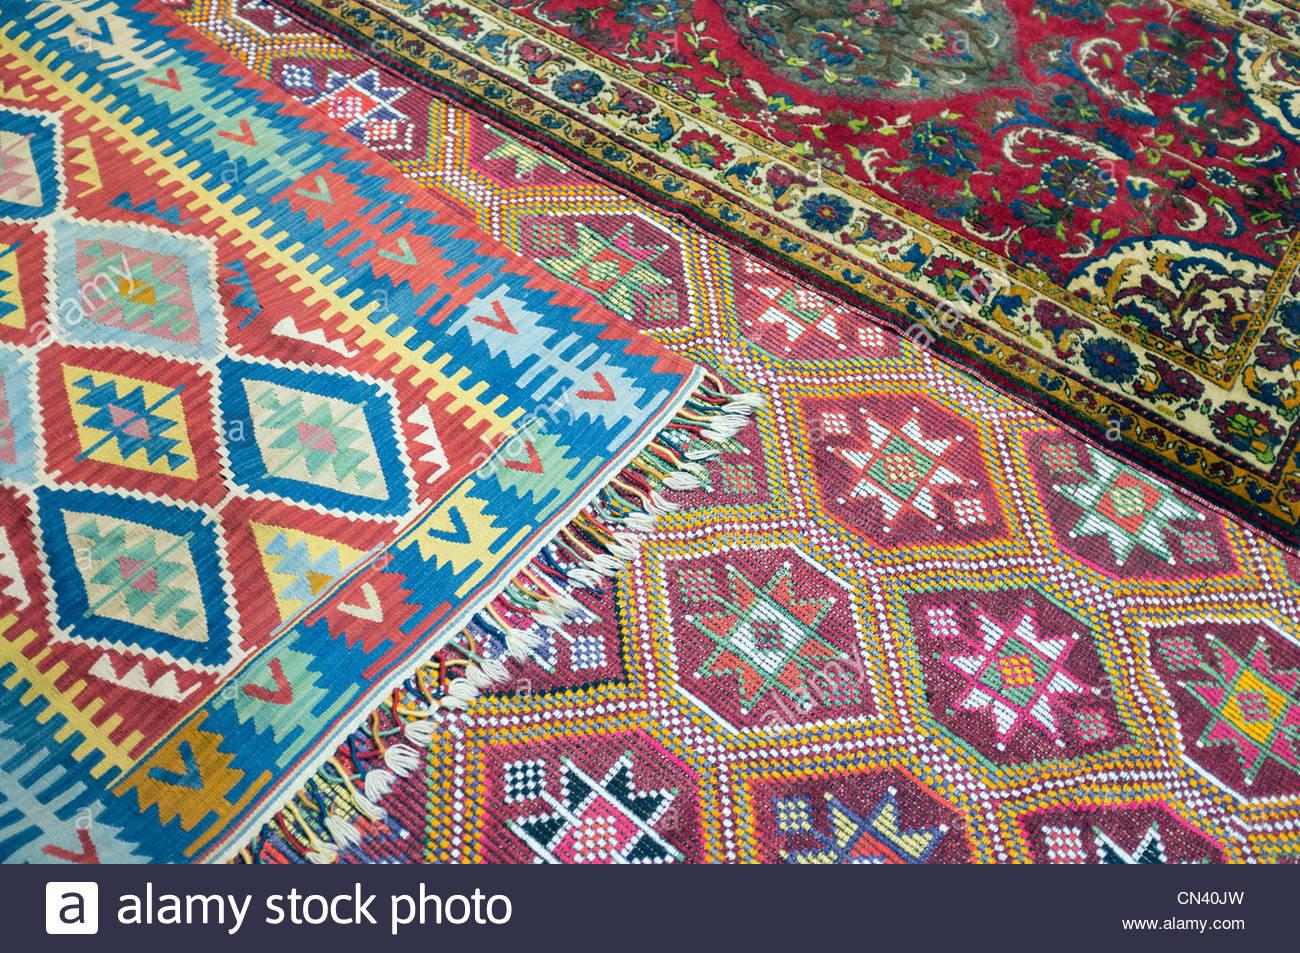 Turkish rugs, Selçuk, İzmir Province, Turkey - Stock Image